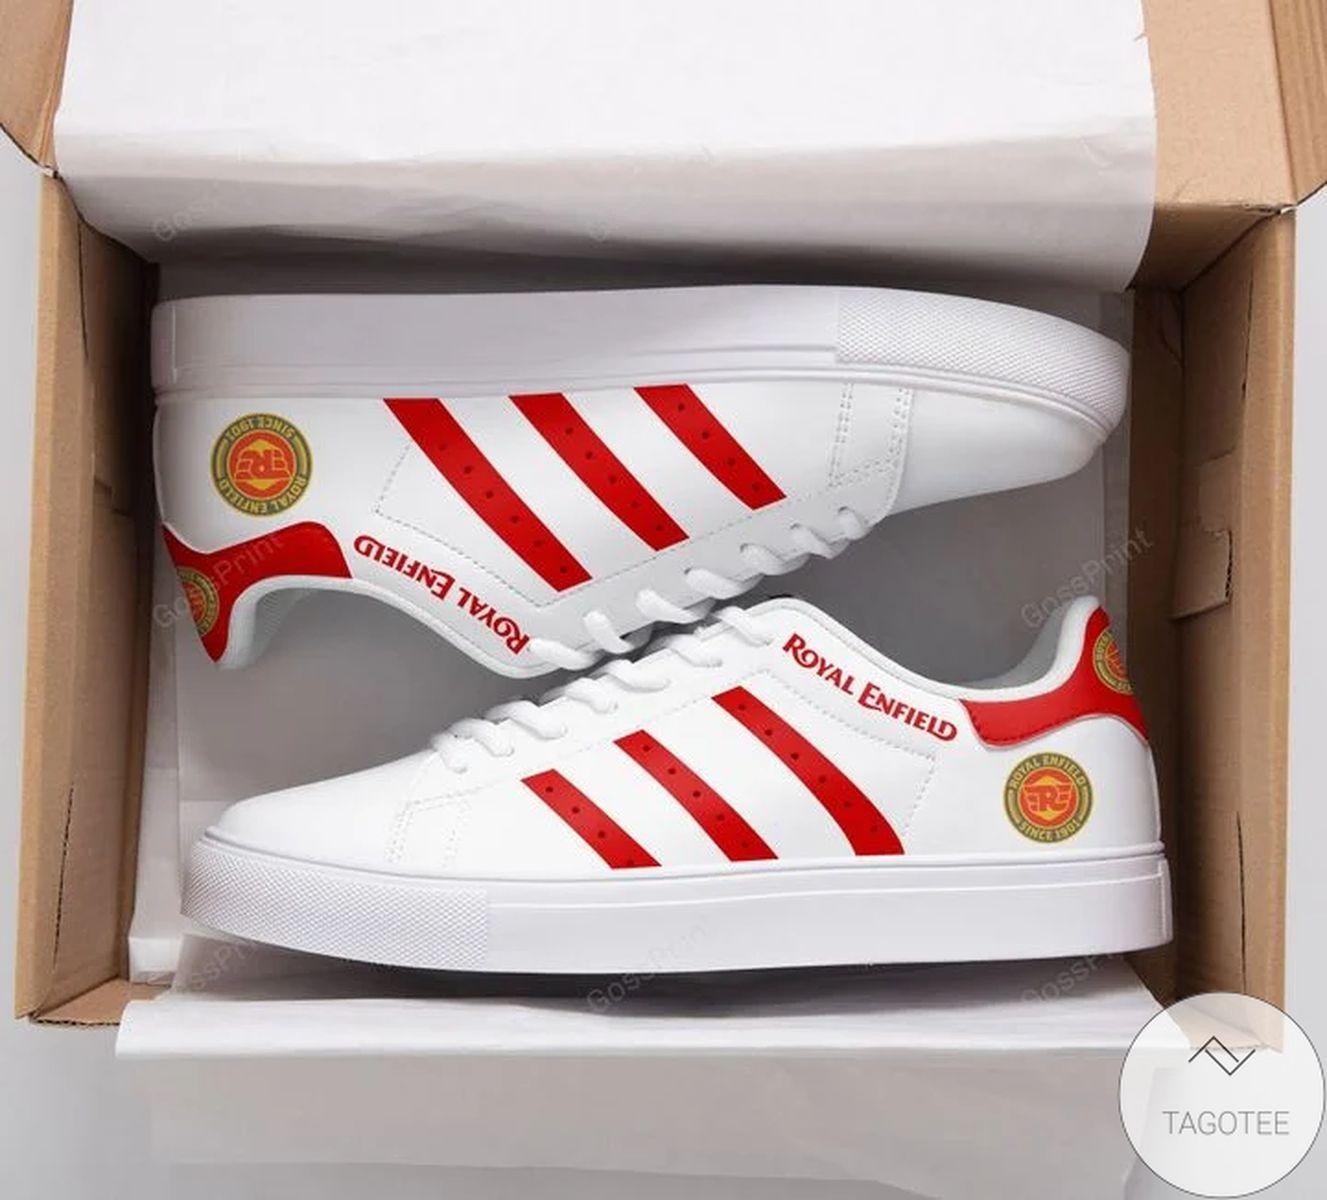 Royal Enfield Stan Smith Shoes